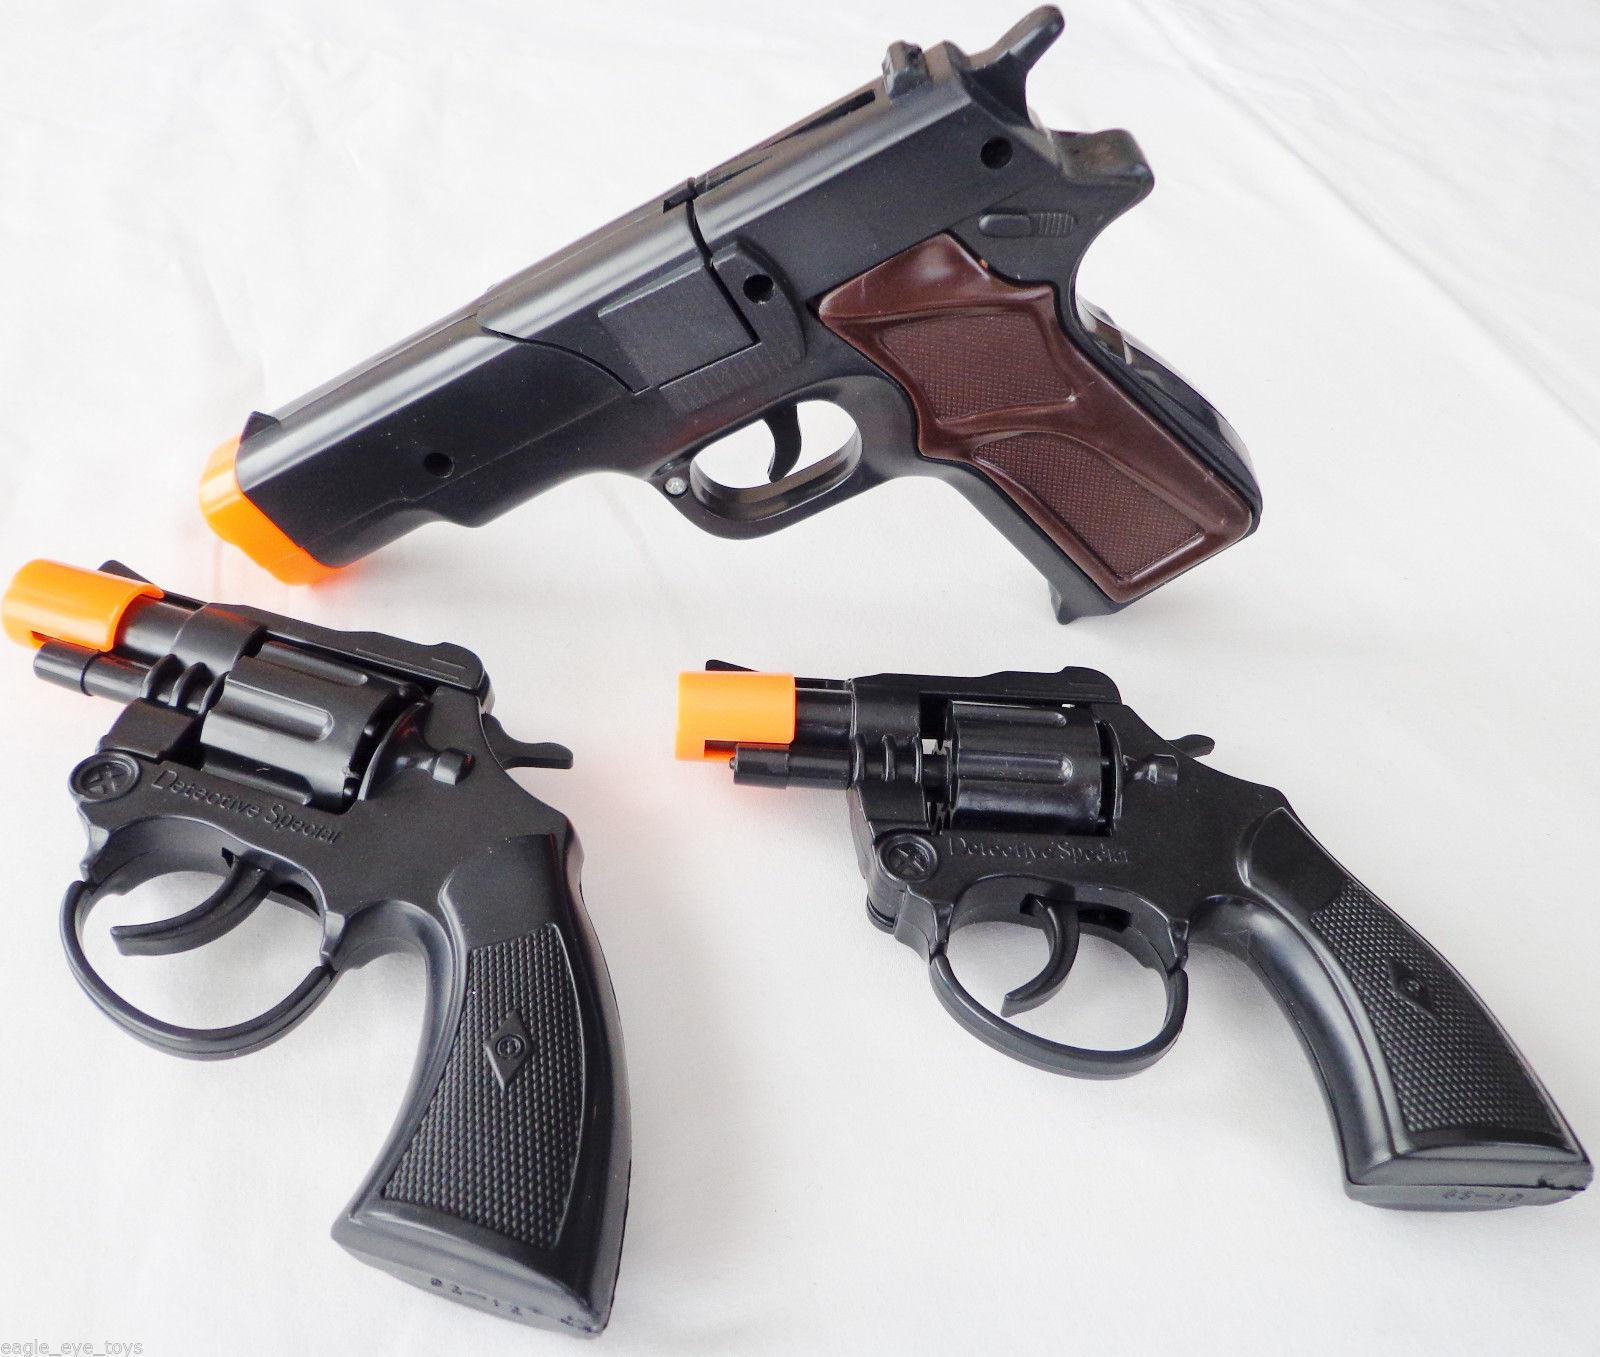 Eagle eye guns coupons